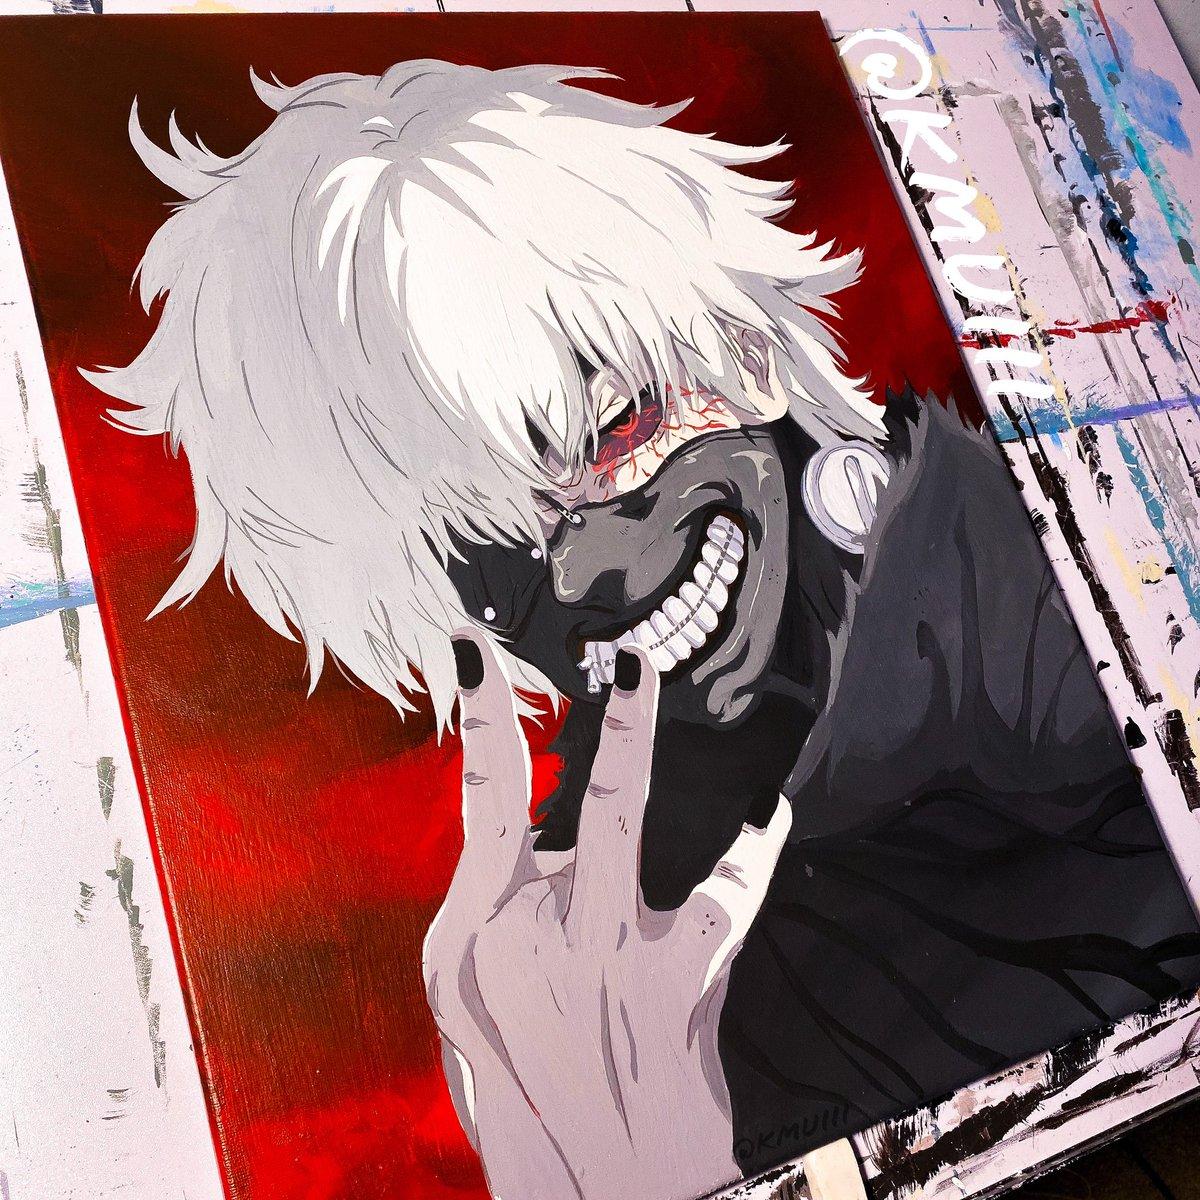 Who should i paint next? #tokyoghoul #animepainting #anime #painting #acrylic #kanekiken #kaneki #manga #artist #art #paintpic.twitter.com/FBYHs3lXUe